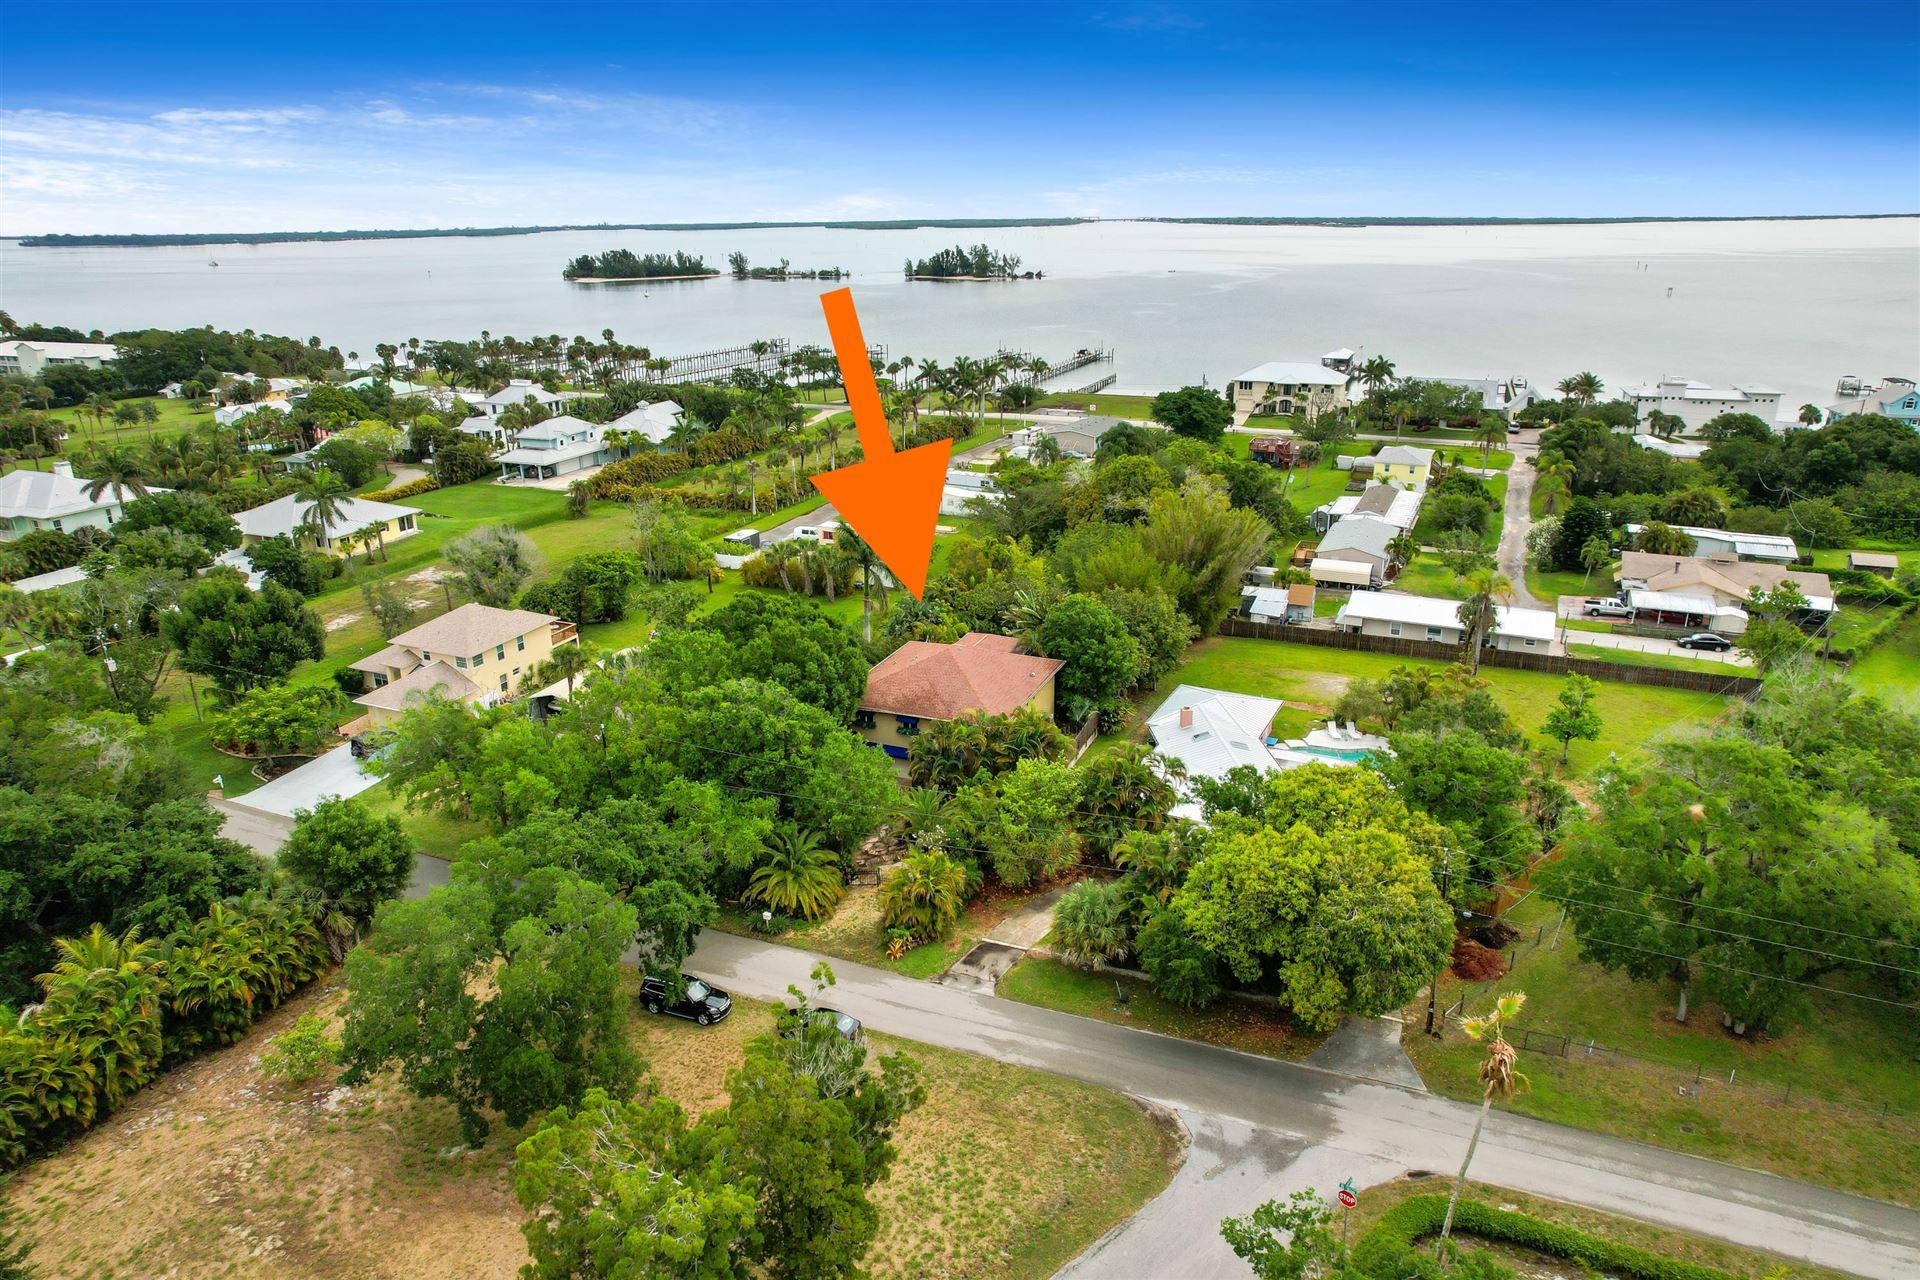 13330 Old Dixie Highway, Sebastian, FL 32958 - MLS#: RX-10695183